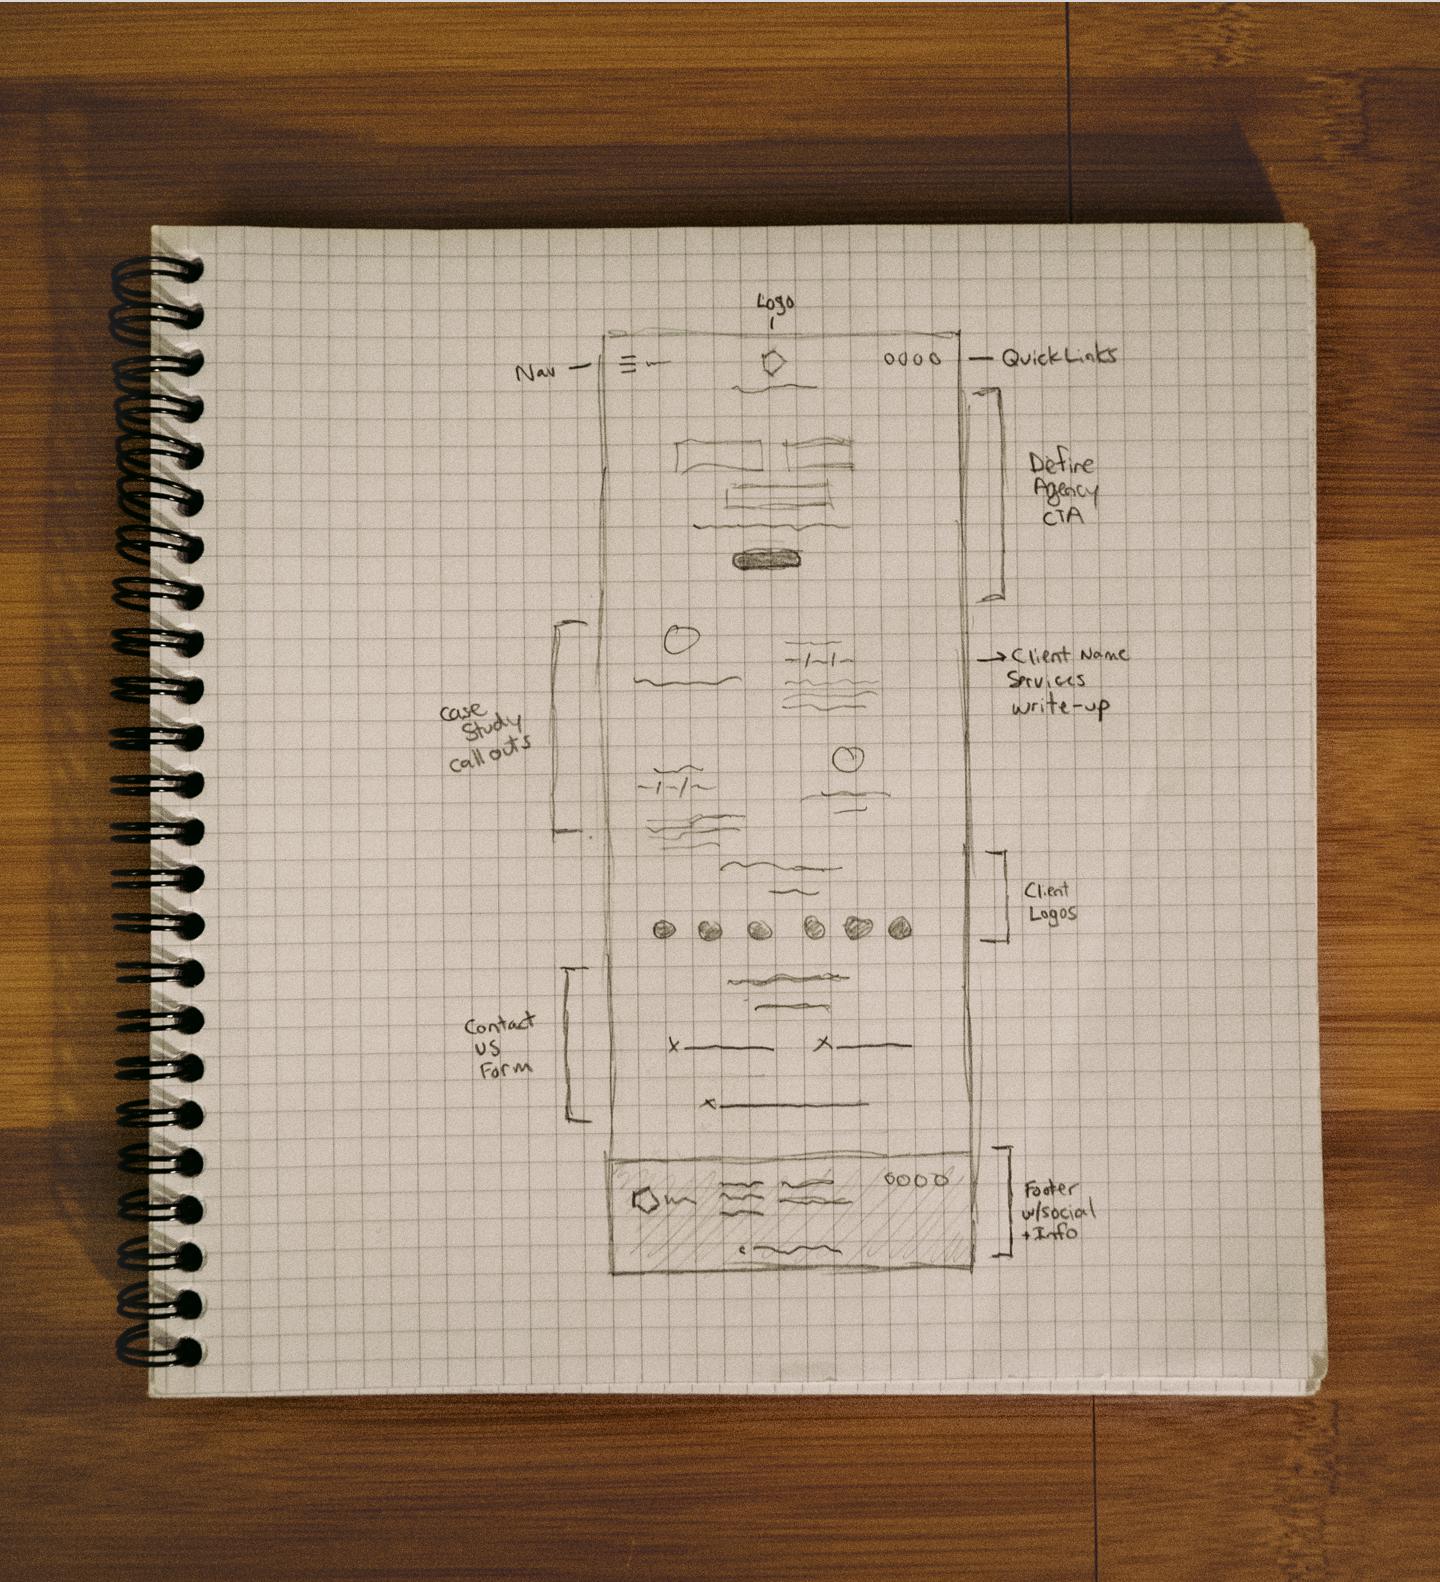 5b - sketch